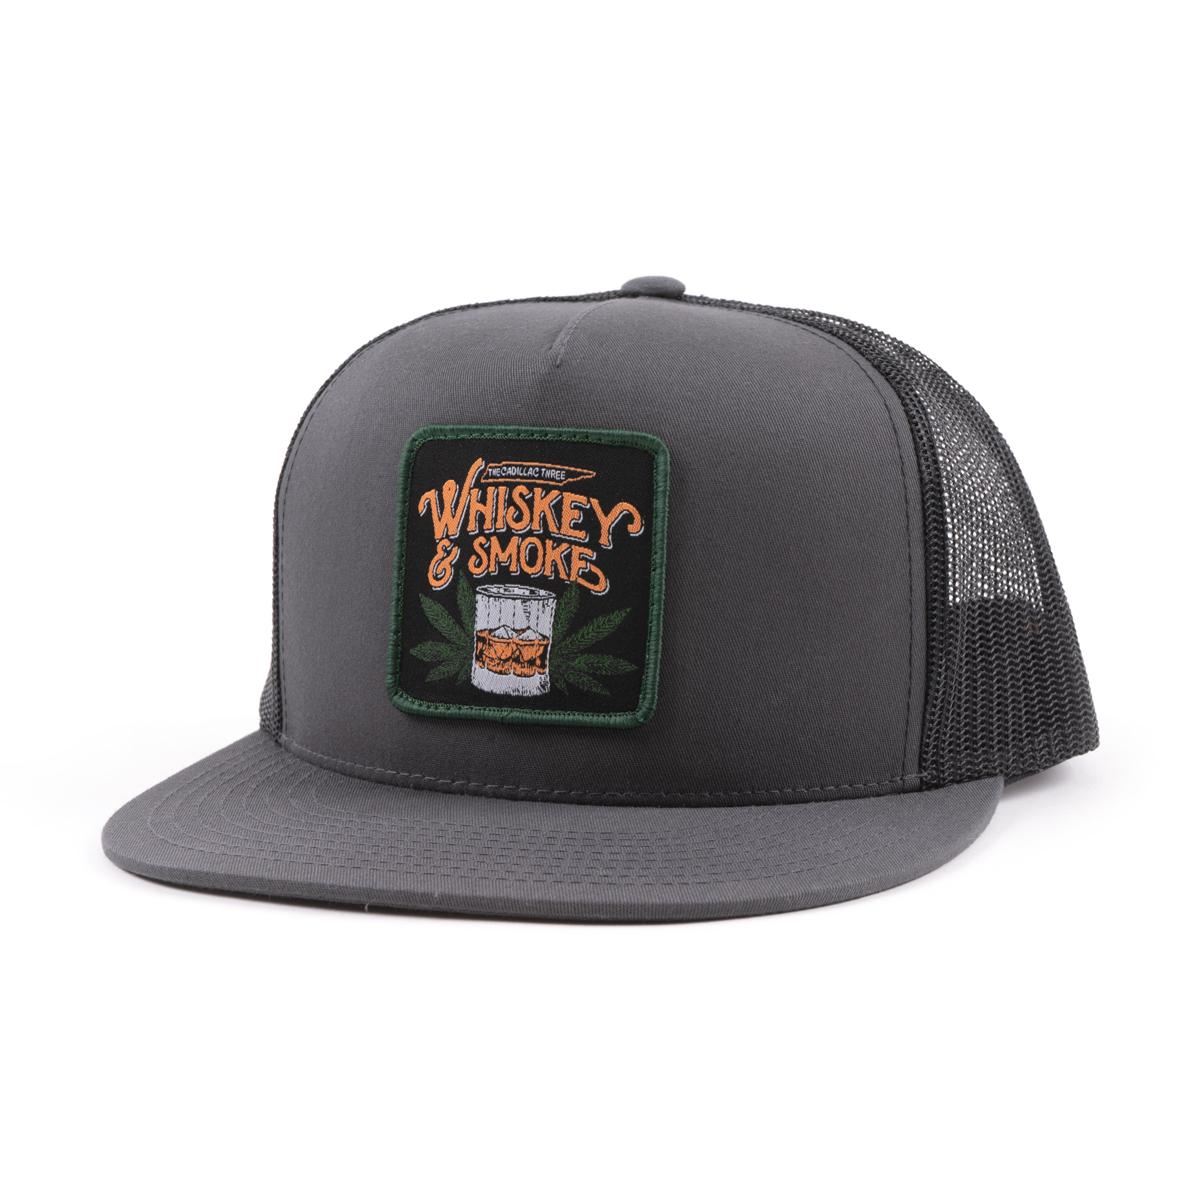 TC3 Whiskey & Smoke Classic Trucker Hat